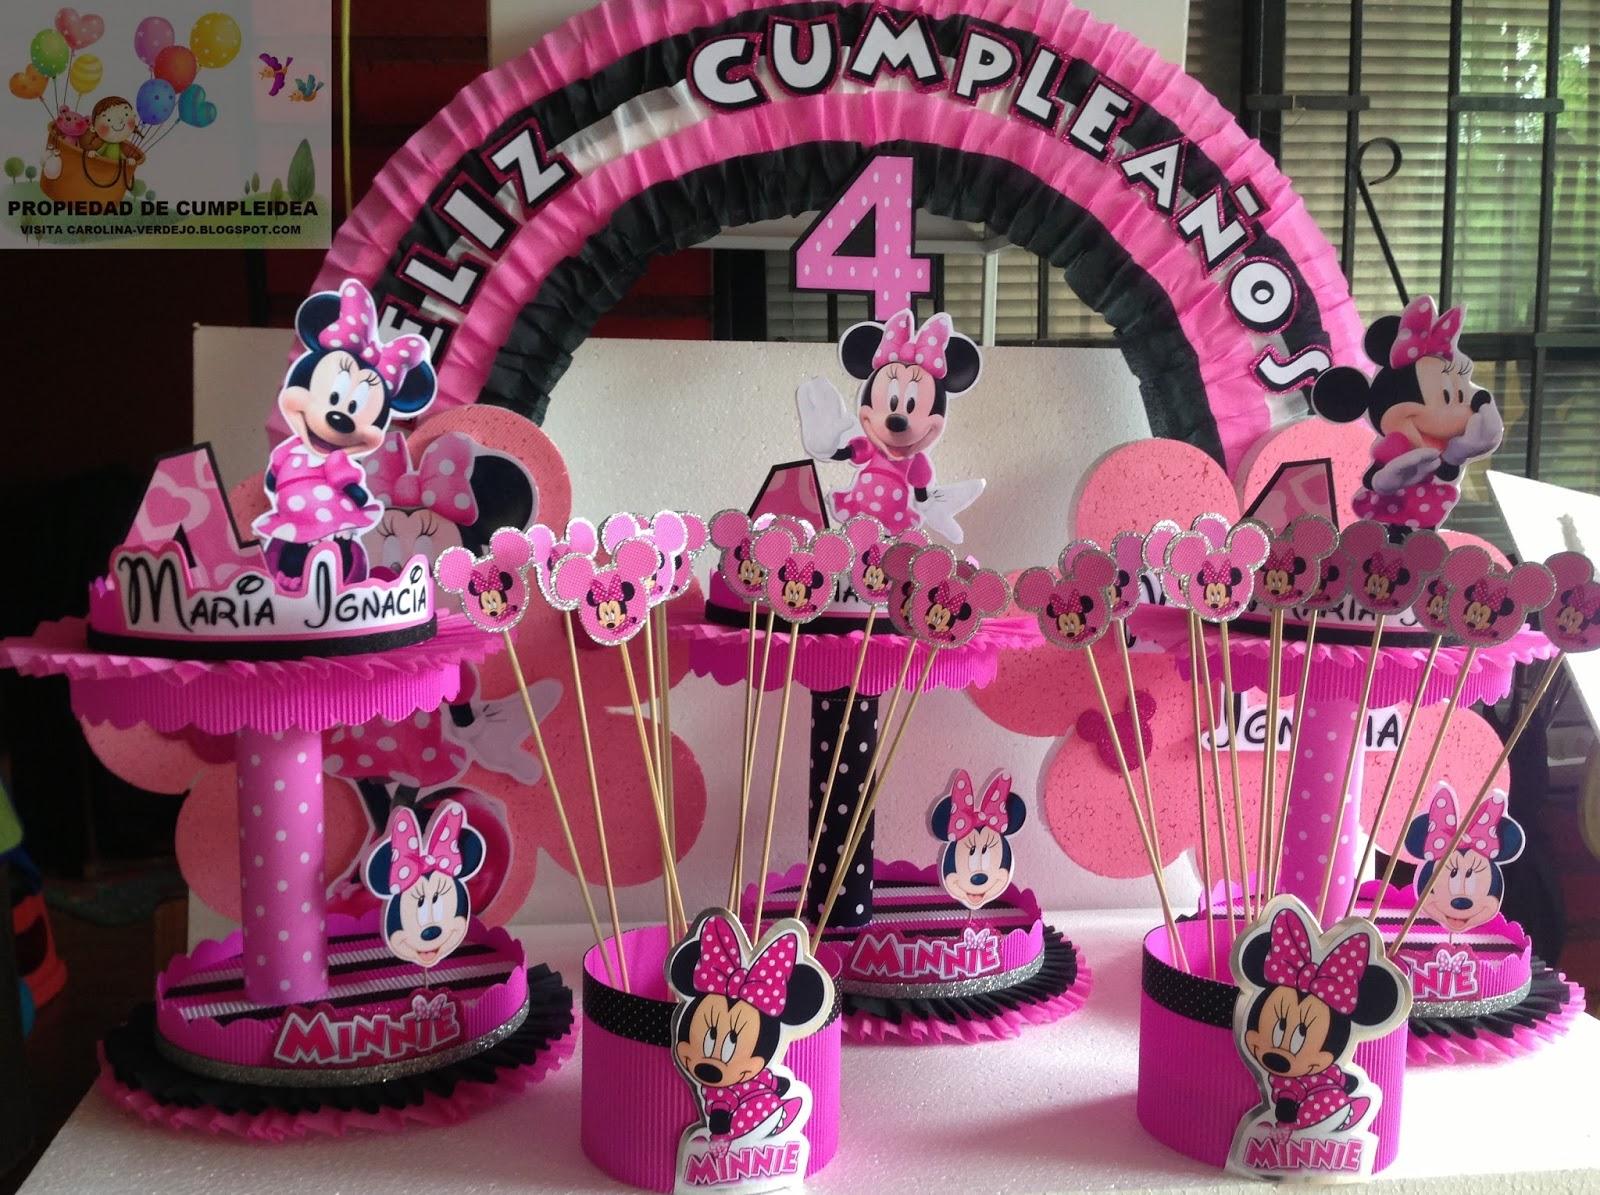 Minnie mouse adornos para cumplea os imagui - Decoracion minnie cumpleanos ...